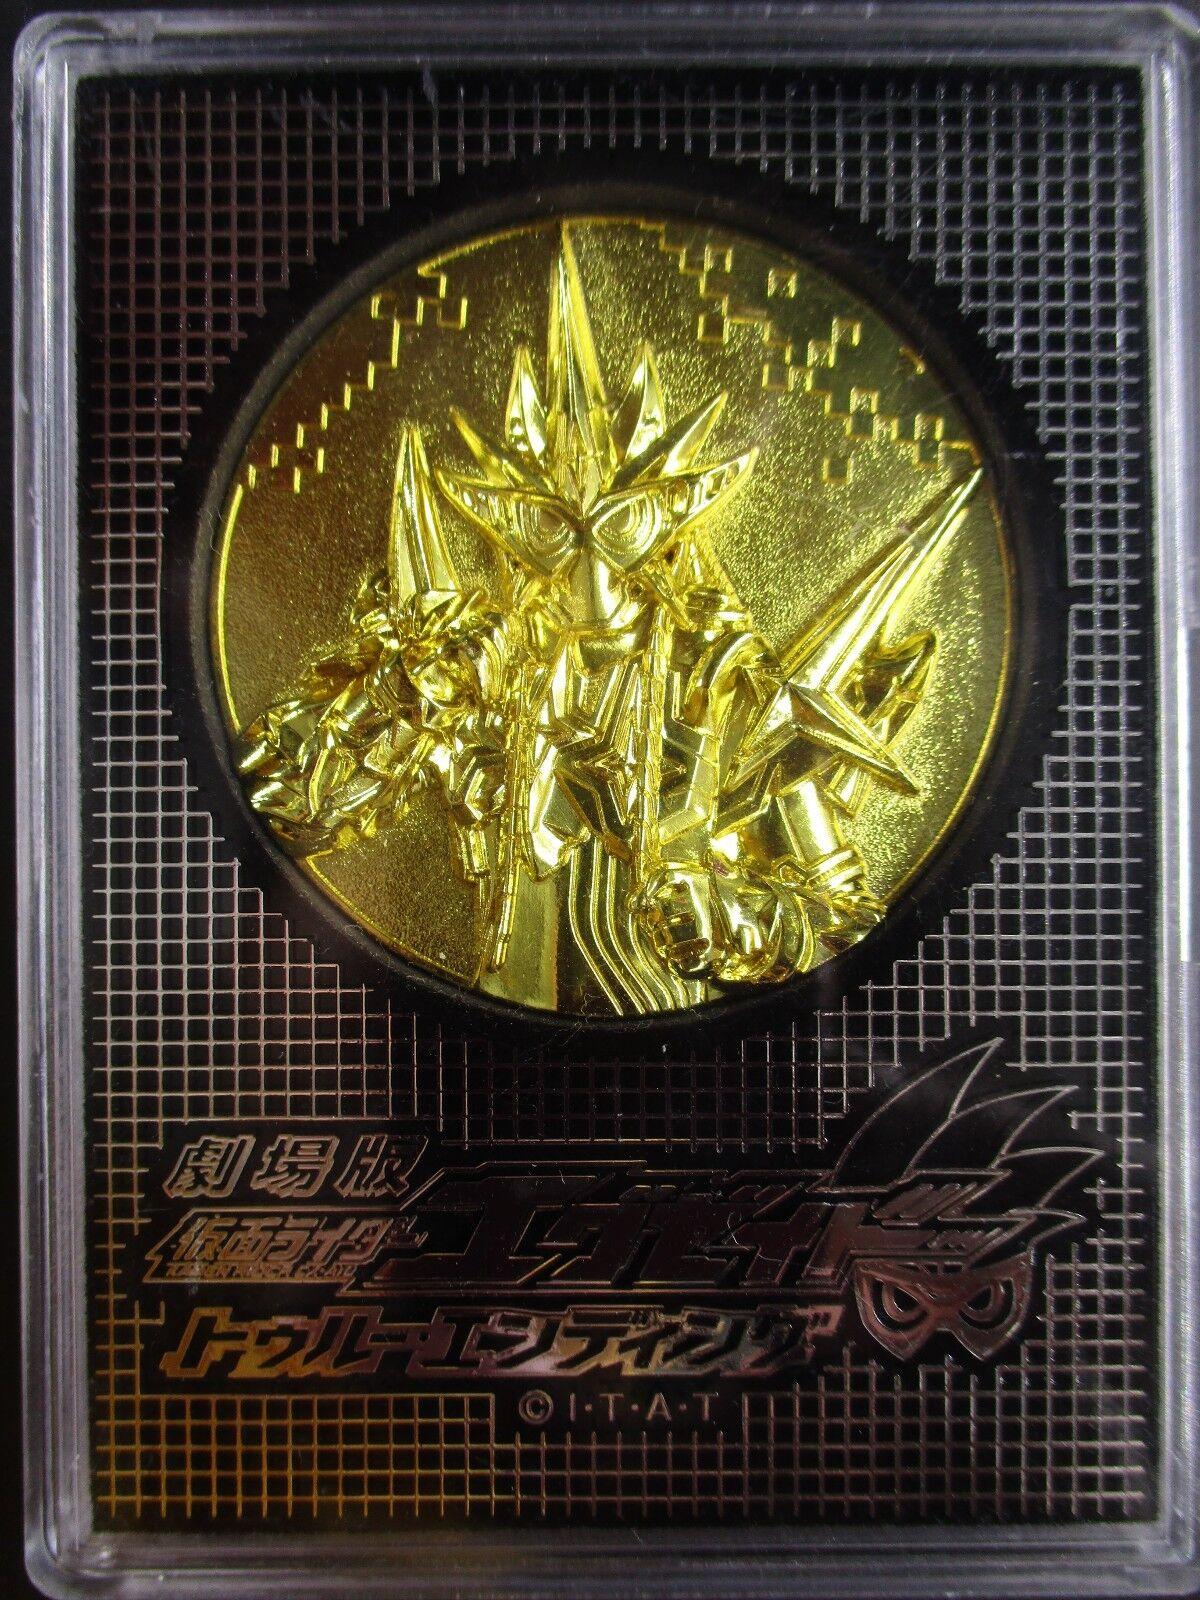 Kamen Rider EX-AID invincible Muteki gamer Toei Movie version Japanese medals